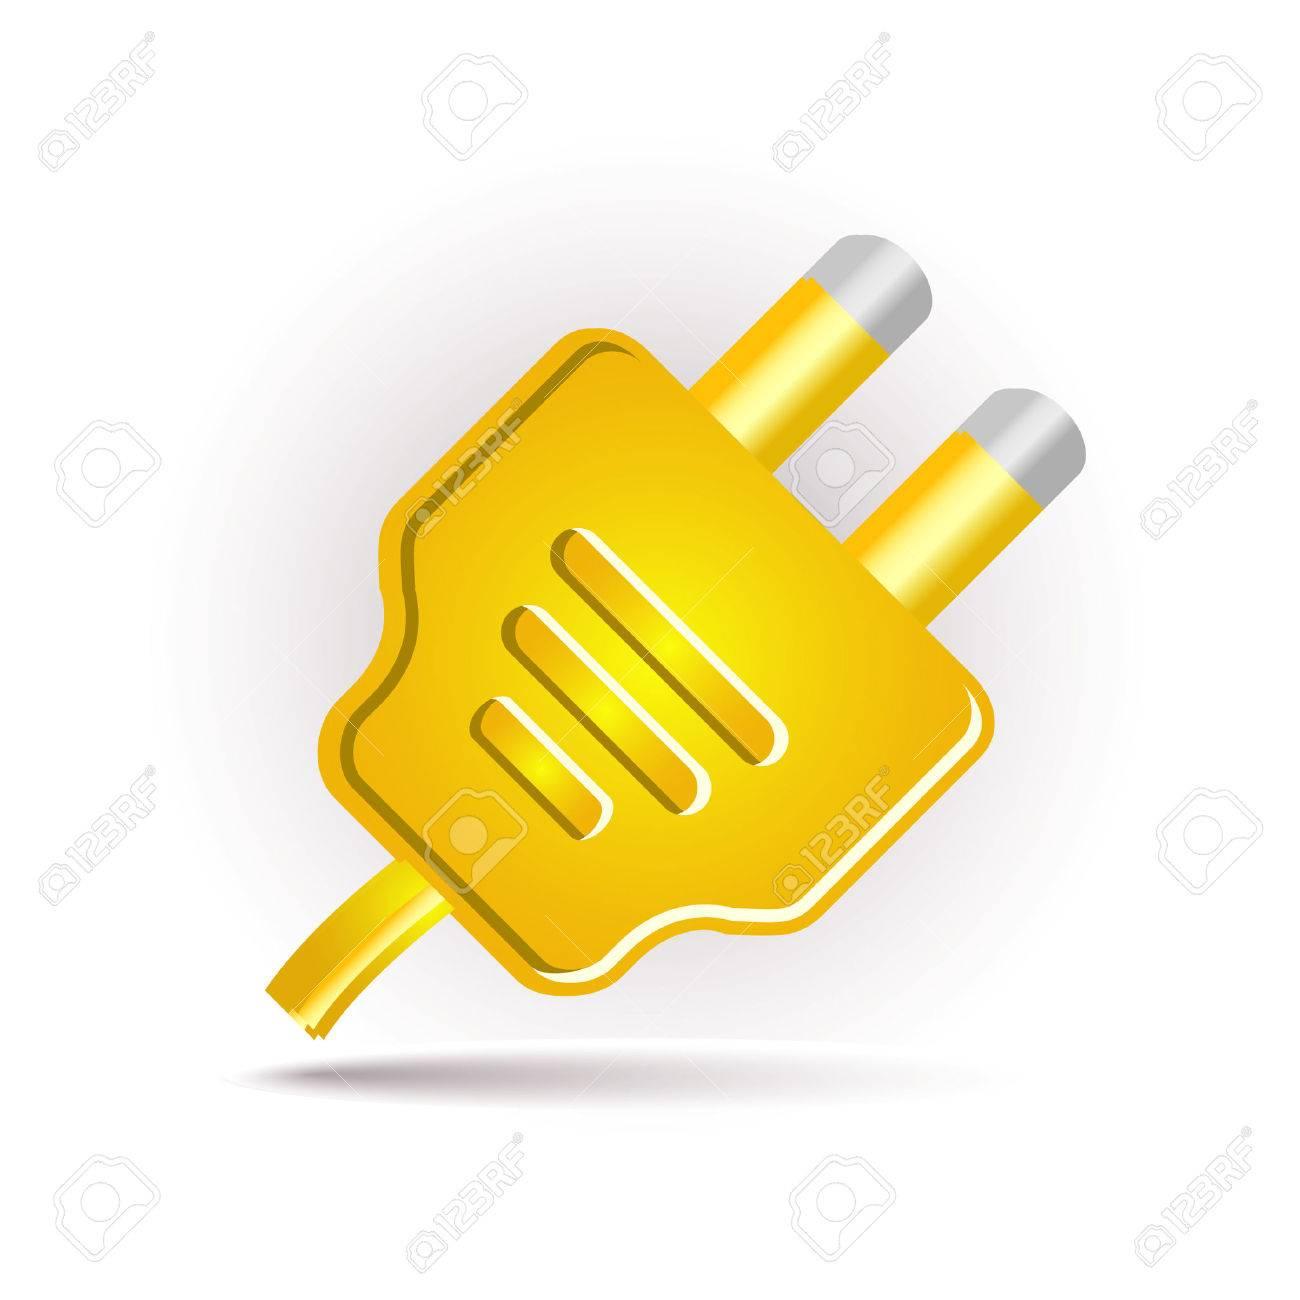 yellow plug in Stock Vector - 7524840